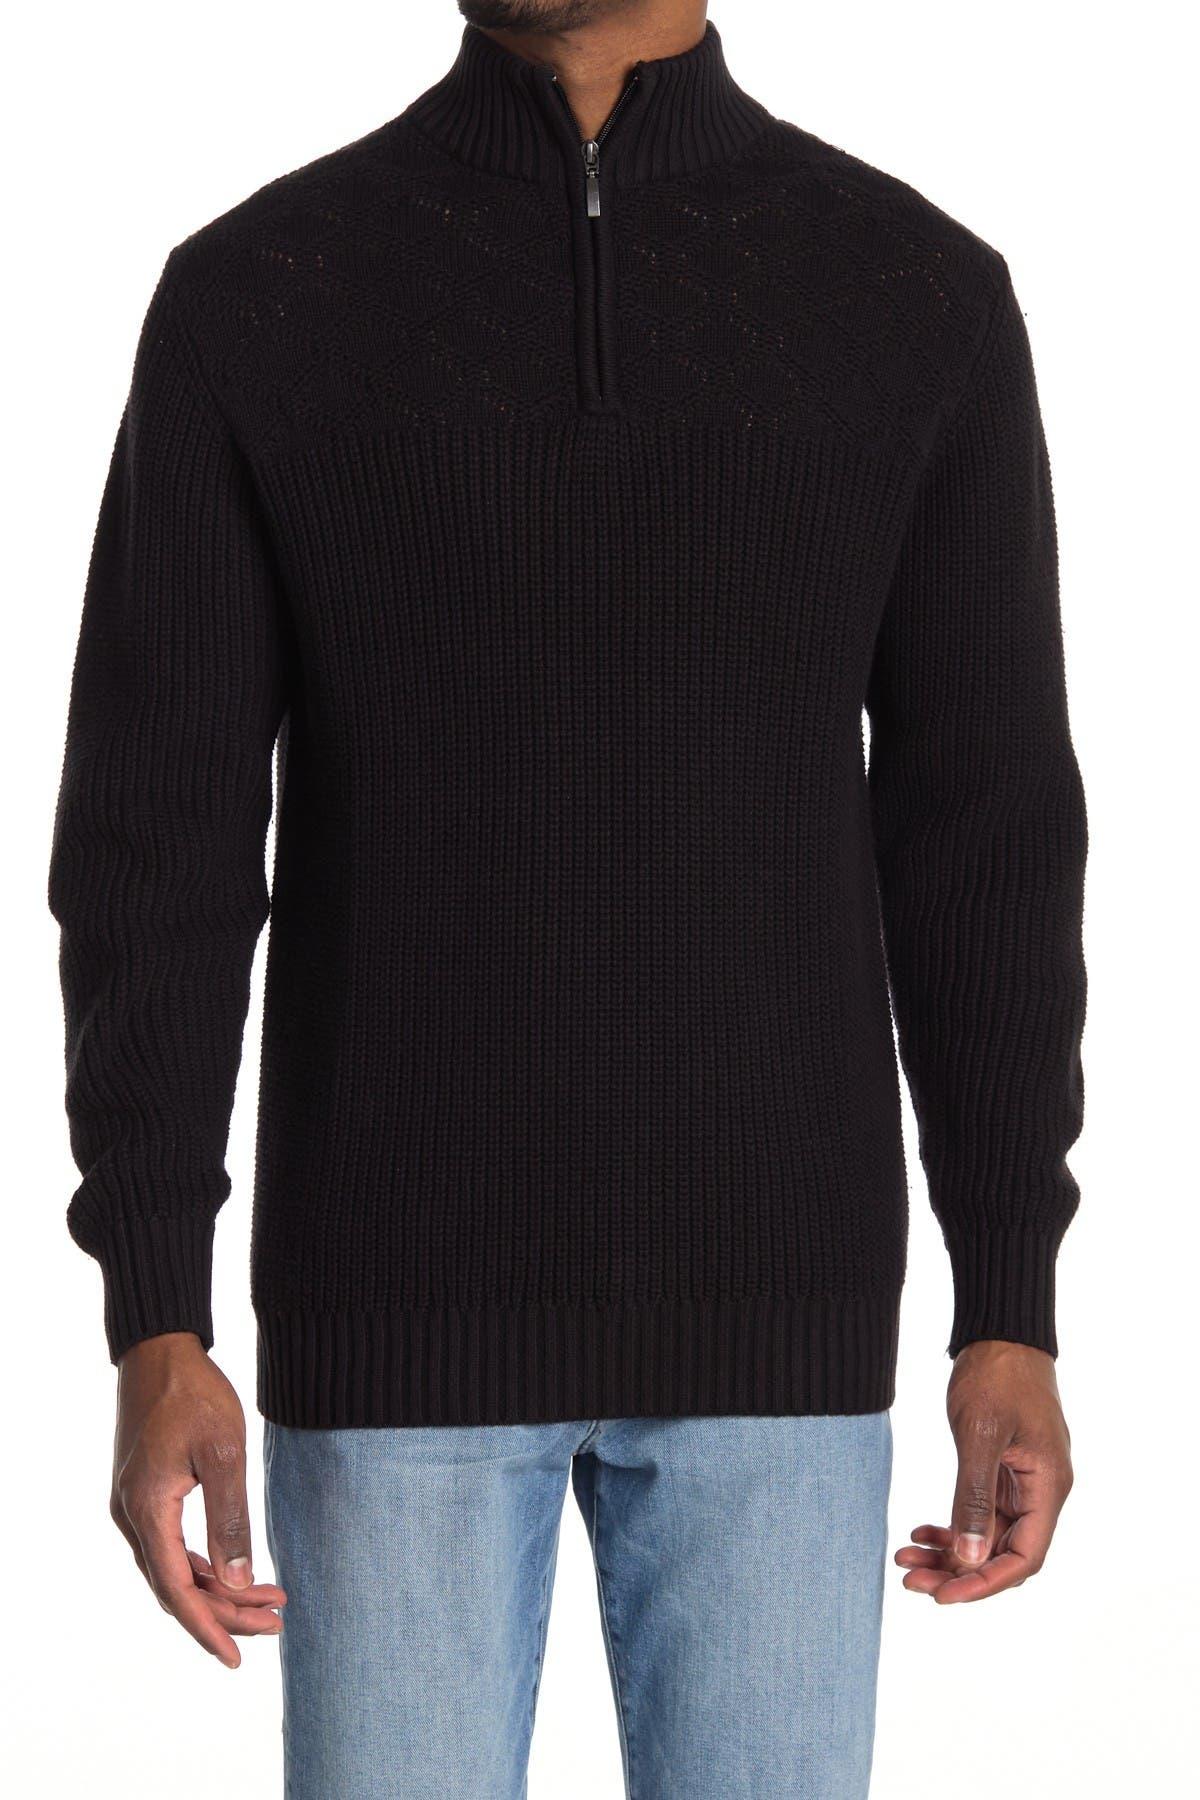 Image of SOUL OF LONDON Quarter Zip Organic Cotton Sweater